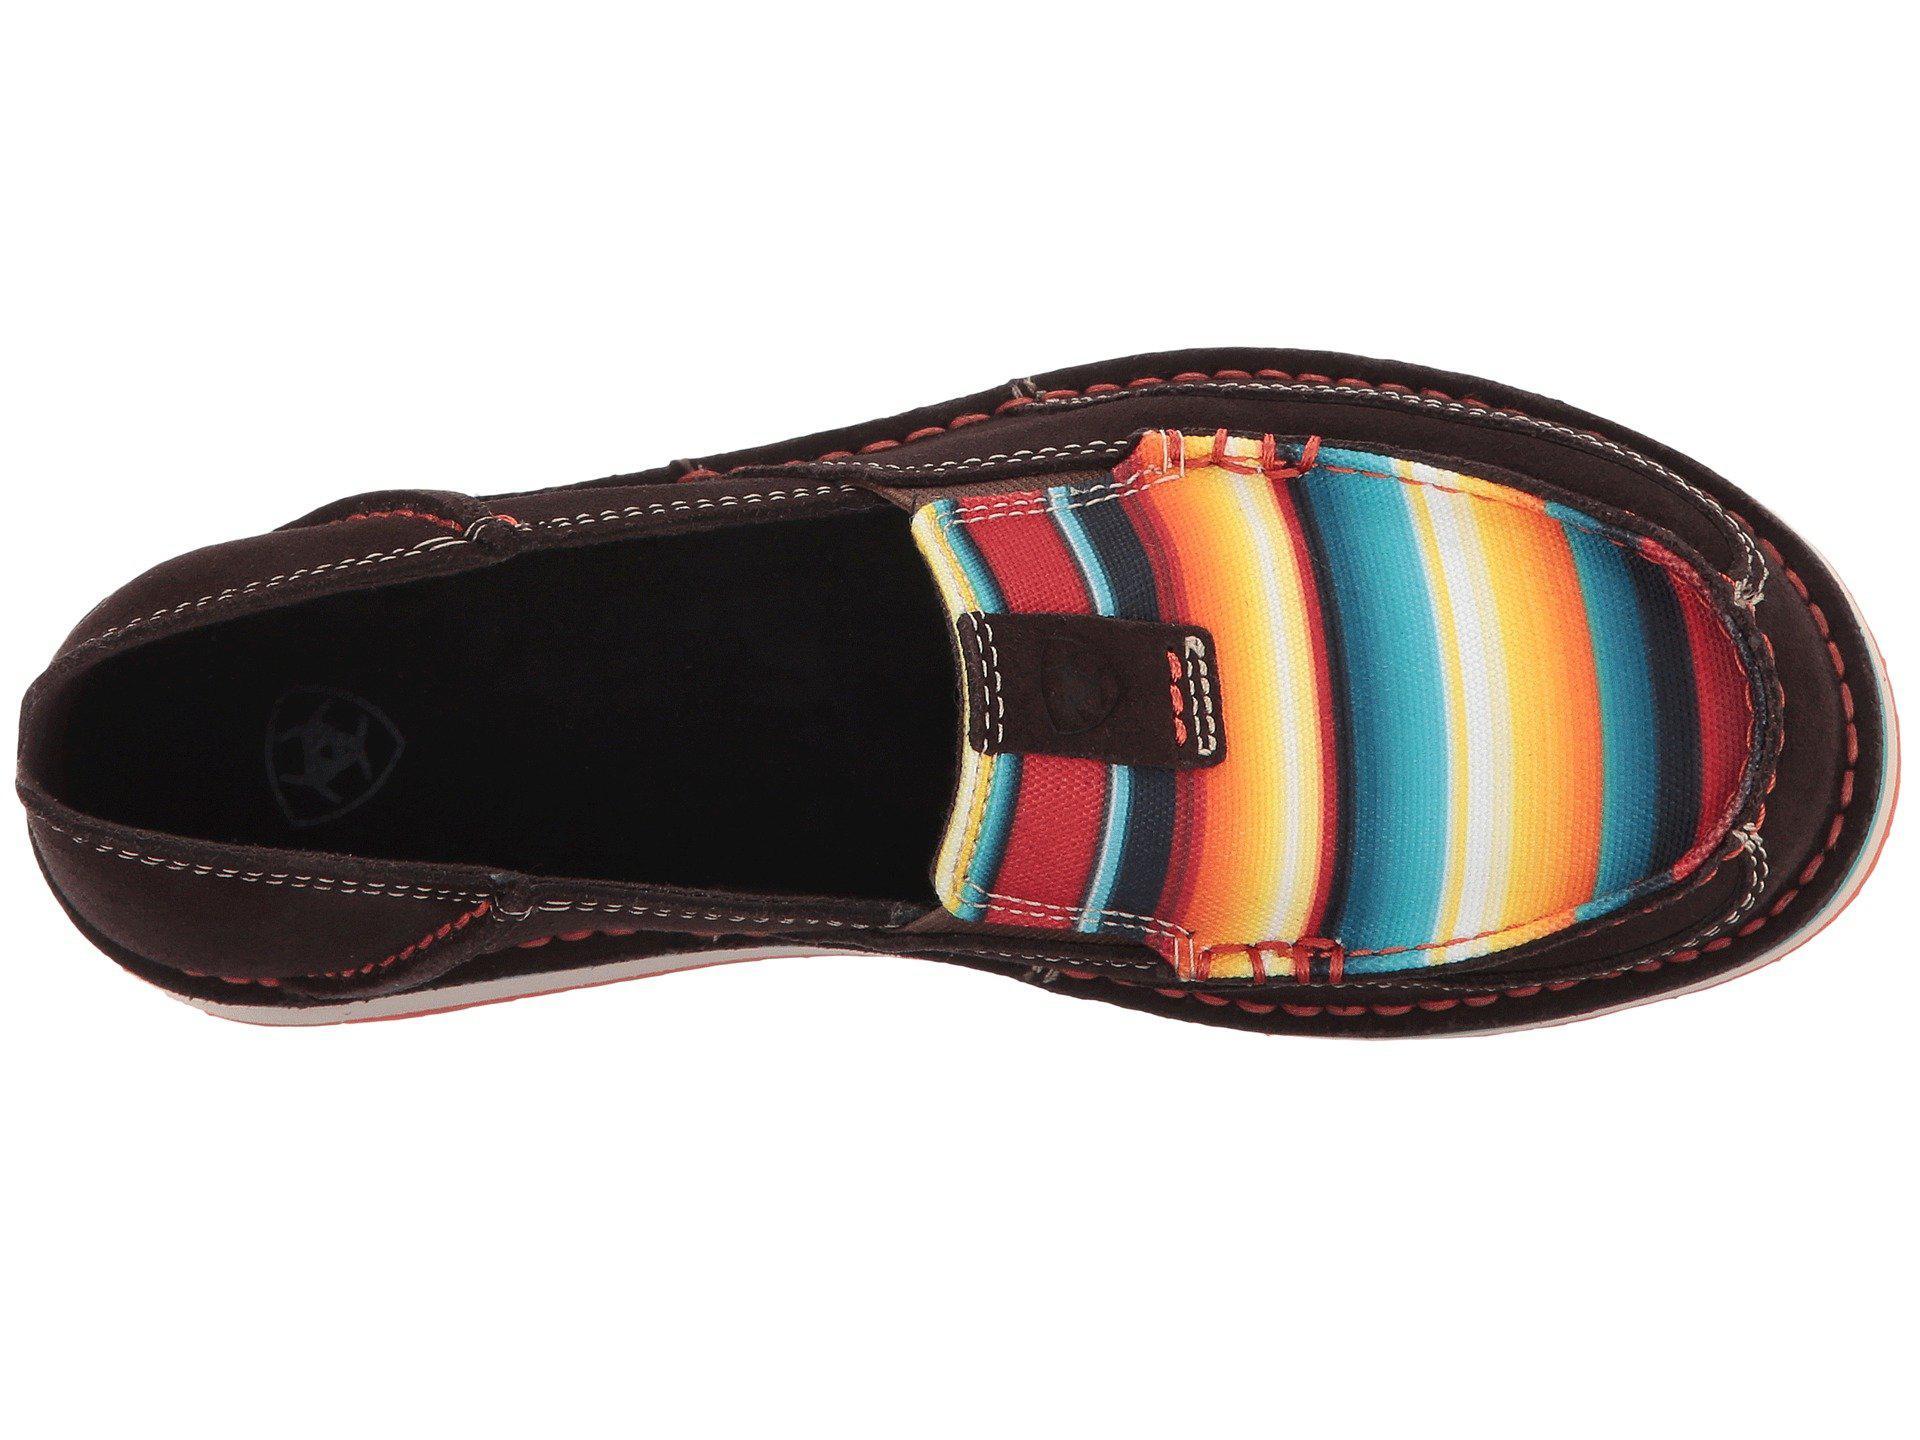 8b967141 Ariat - Red Cruiser (bean Suede/pastel Aztec Print) Women's Slip On Shoes.  View fullscreen